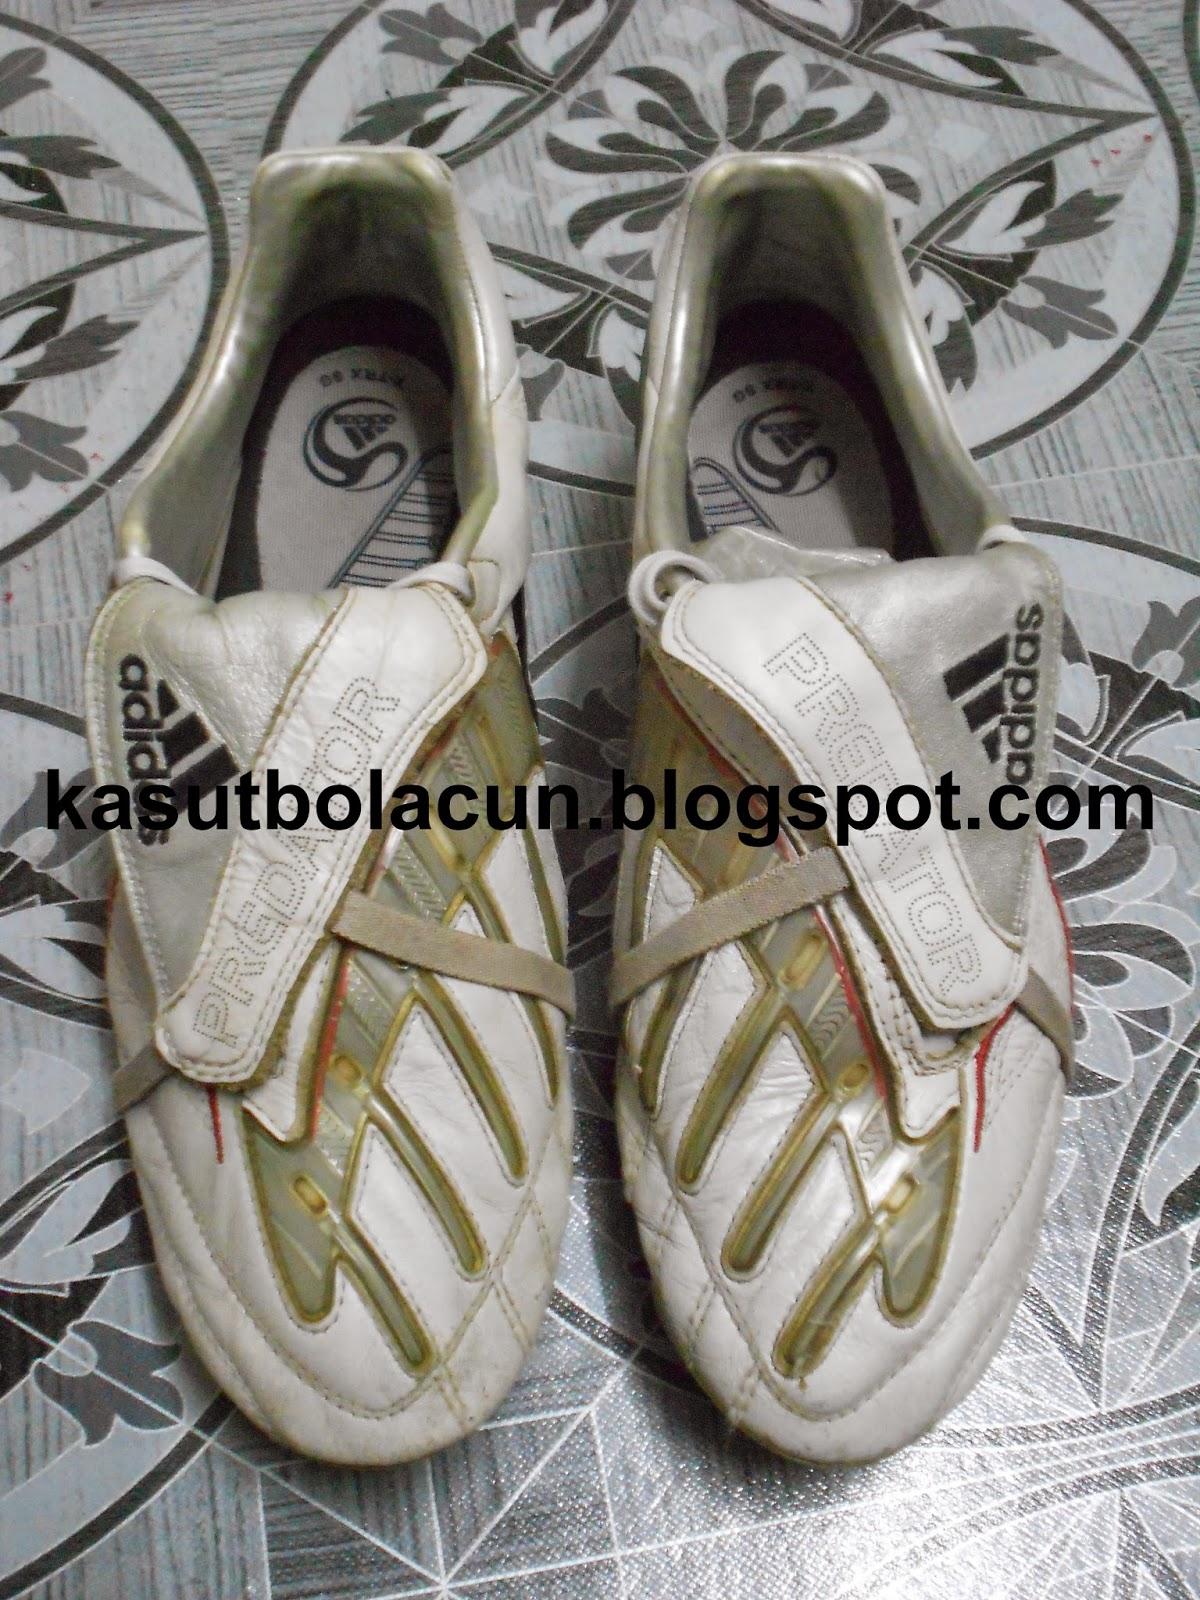 http://kasutbolacun.blogspot.com/2015/01/adidas-predator-powerswerve-sg_19.html